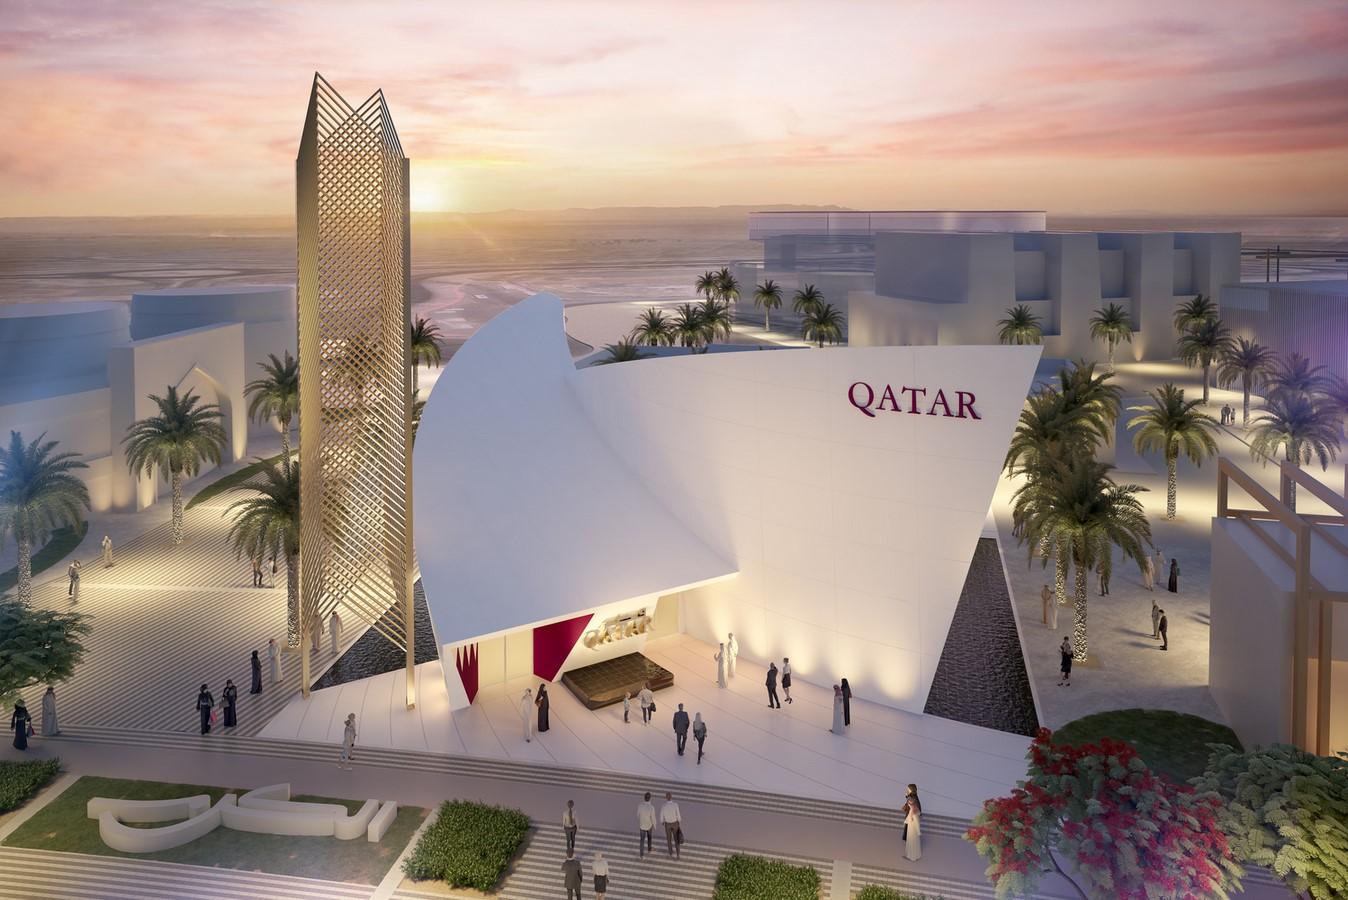 The Qatar Pavilion for the Expo 2020 Dubai design revealed by Santiago Calatrava - Sheet1